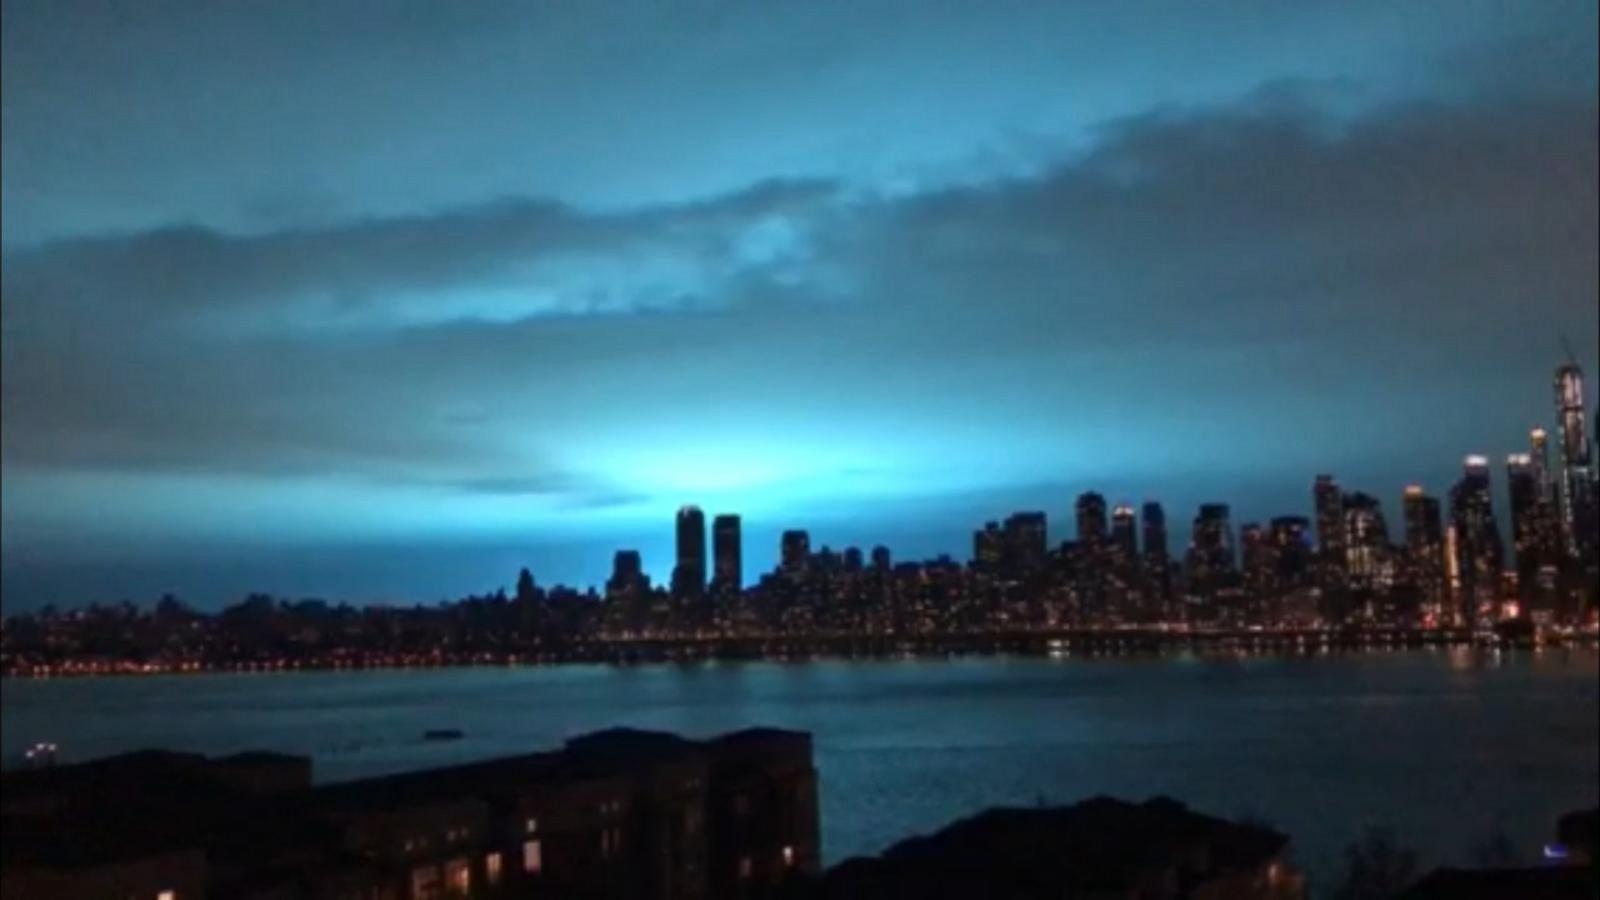 new york city skyline turns bright blue after transformer explosion